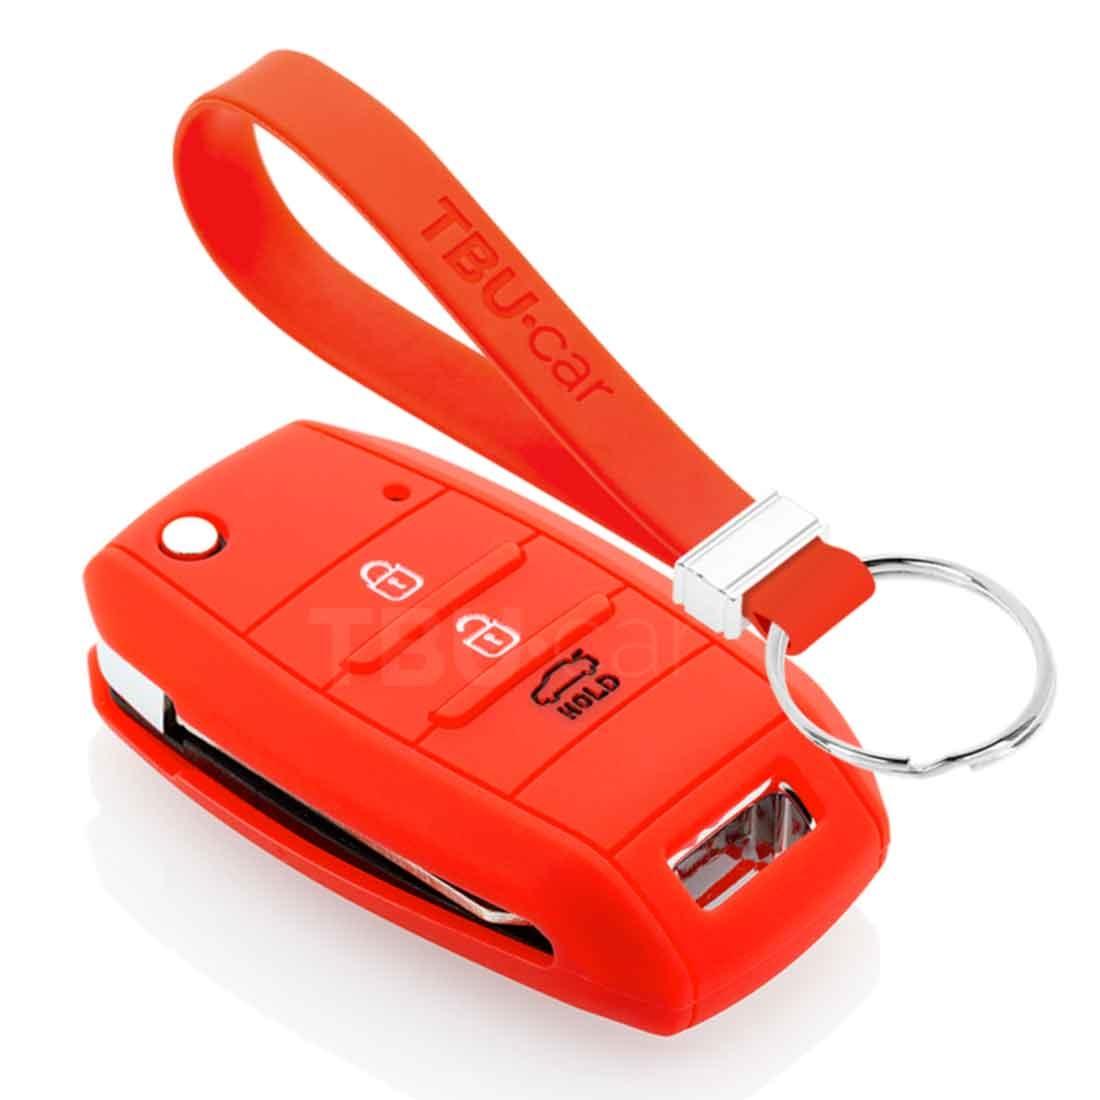 TBU car TBU car Autoschlüssel Hülle kompatibel mit Kia 3 Tasten - Schutzhülle aus Silikon - Auto Schlüsselhülle Cover in Rot